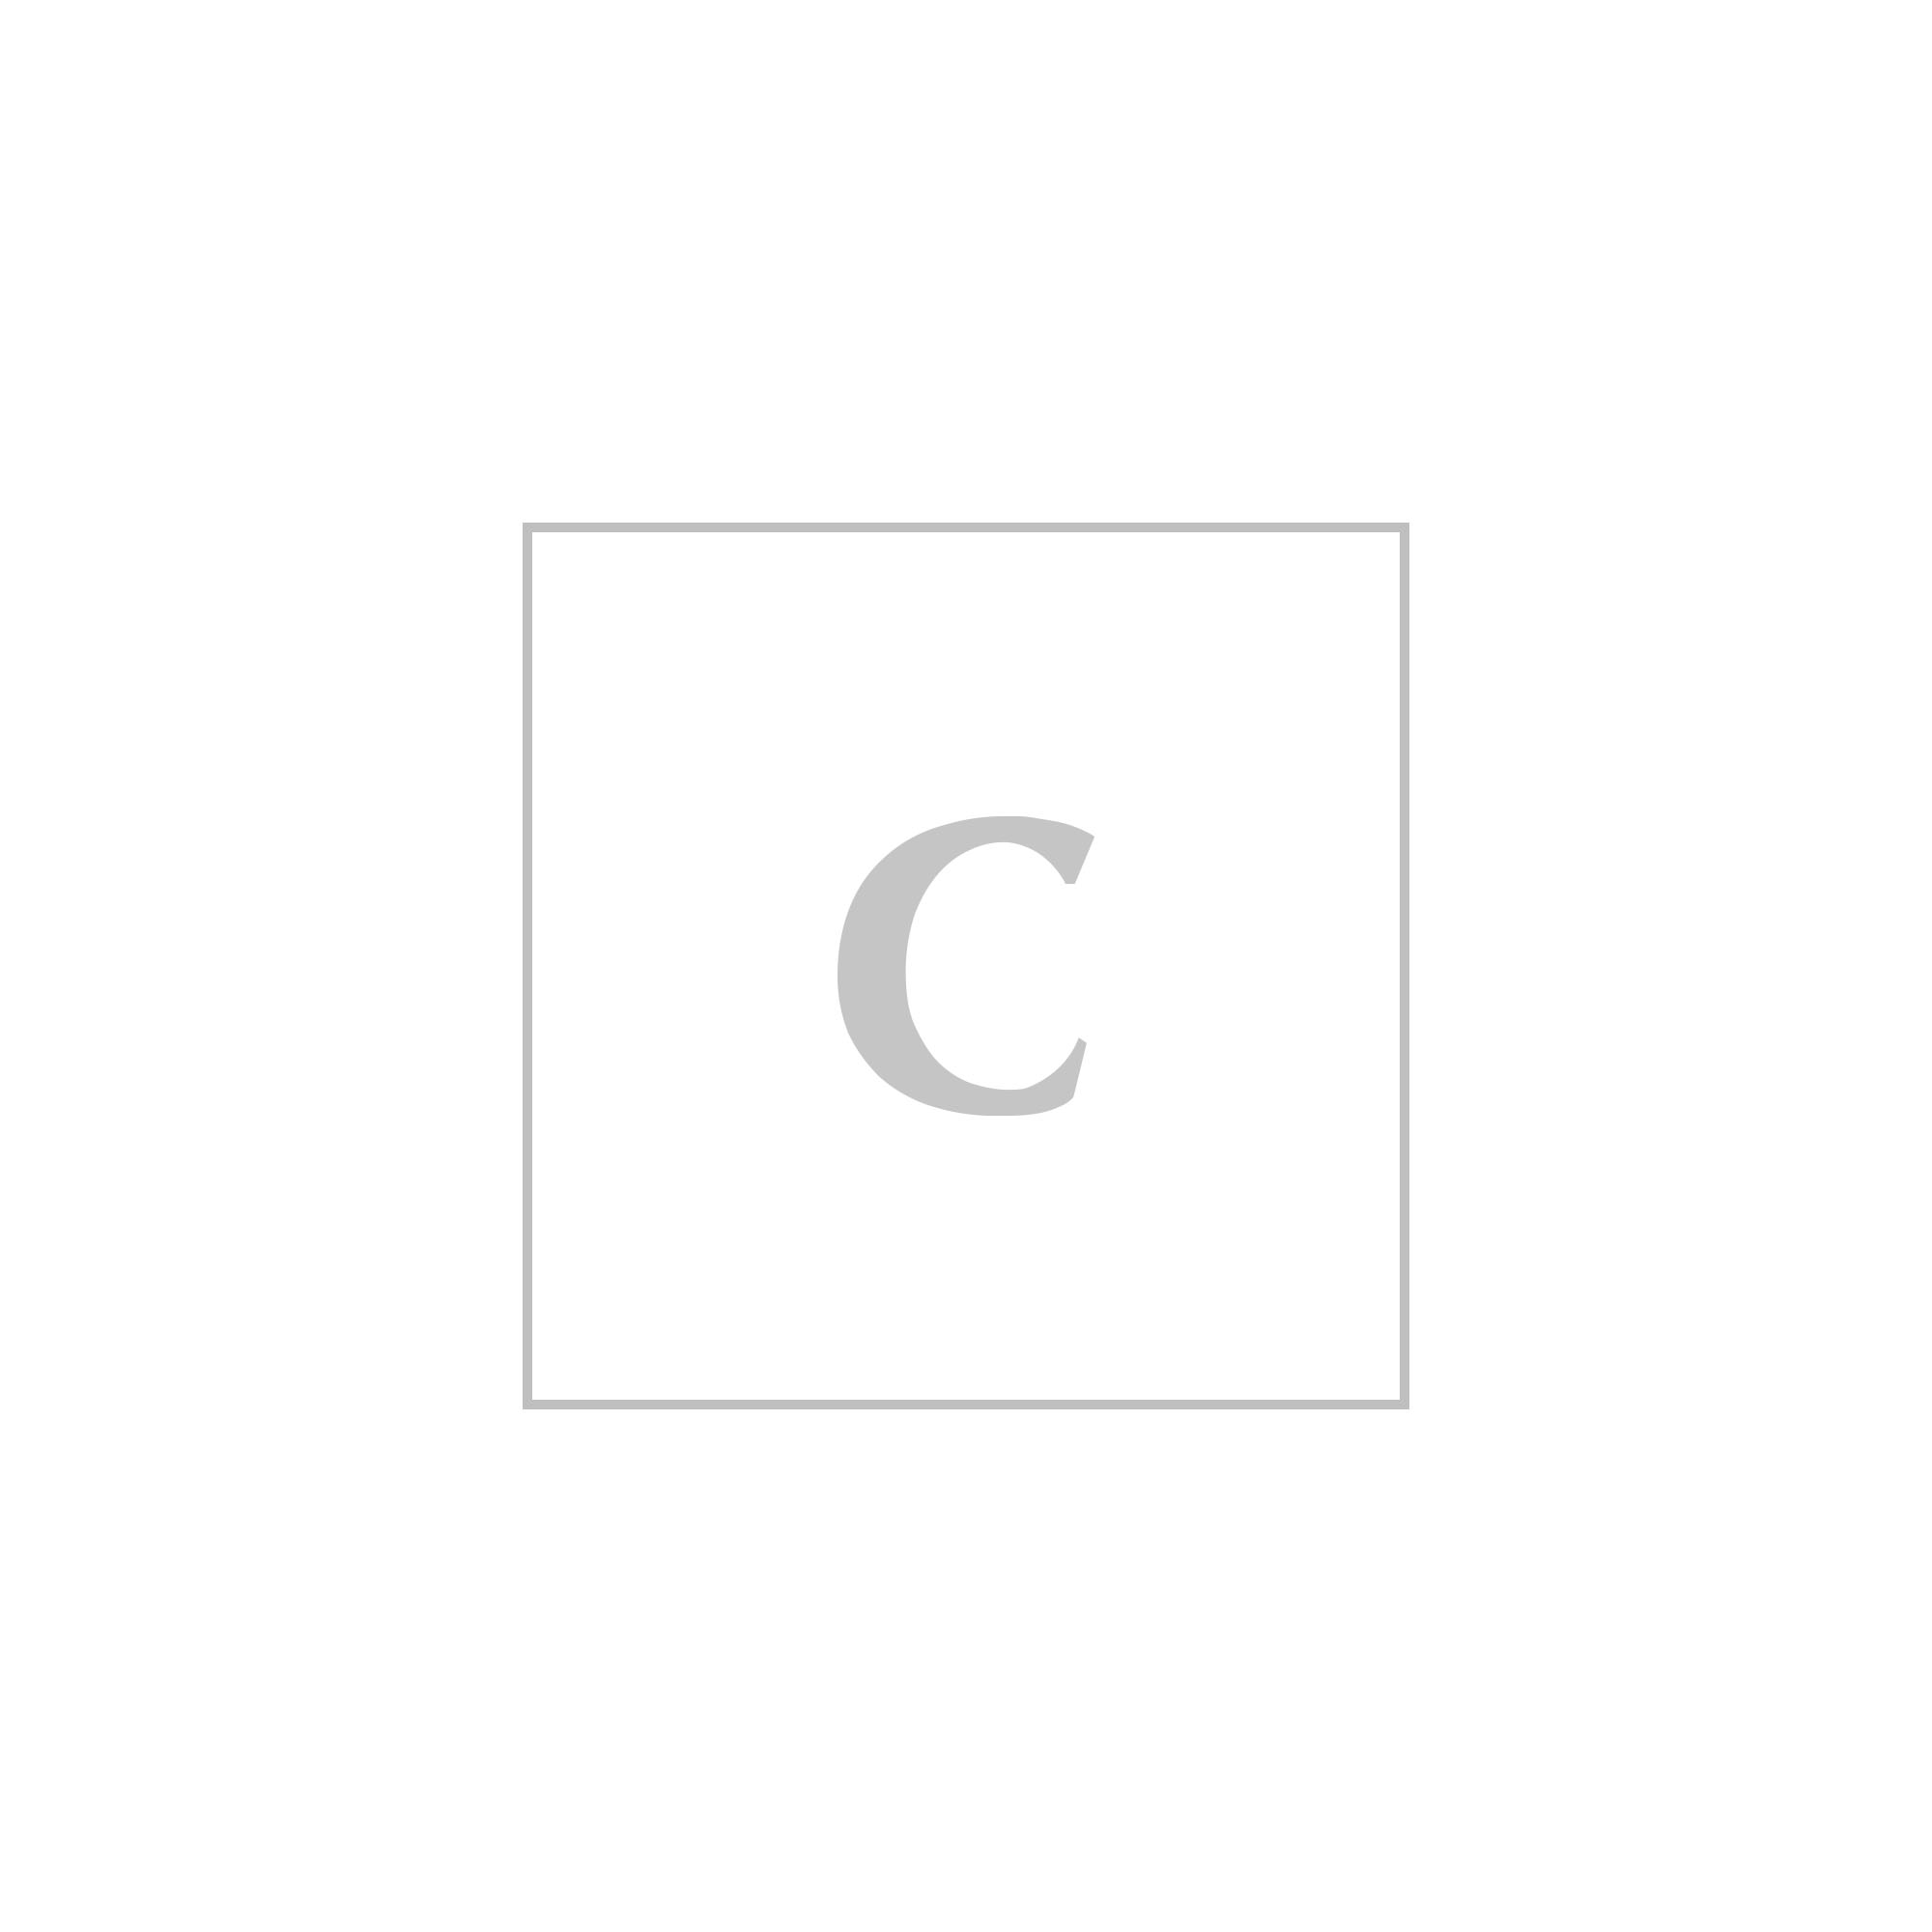 Saint laurent ysl clutch monogramme